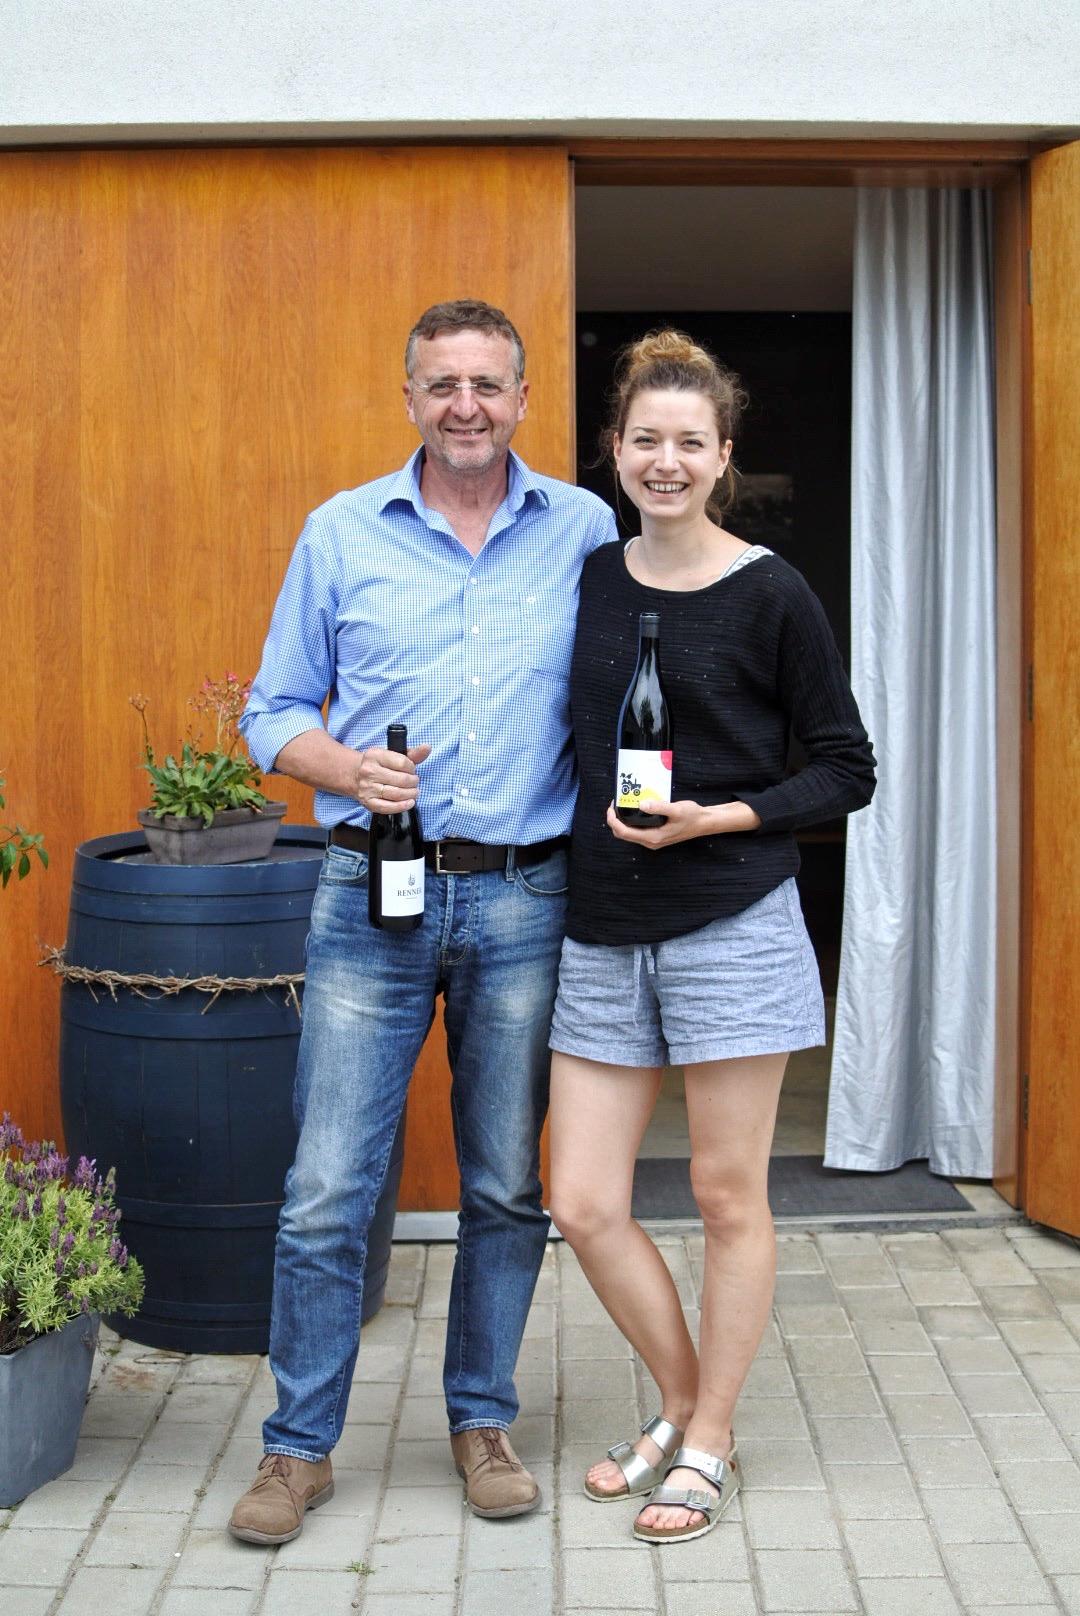 Stefanie and Helmuth Renner